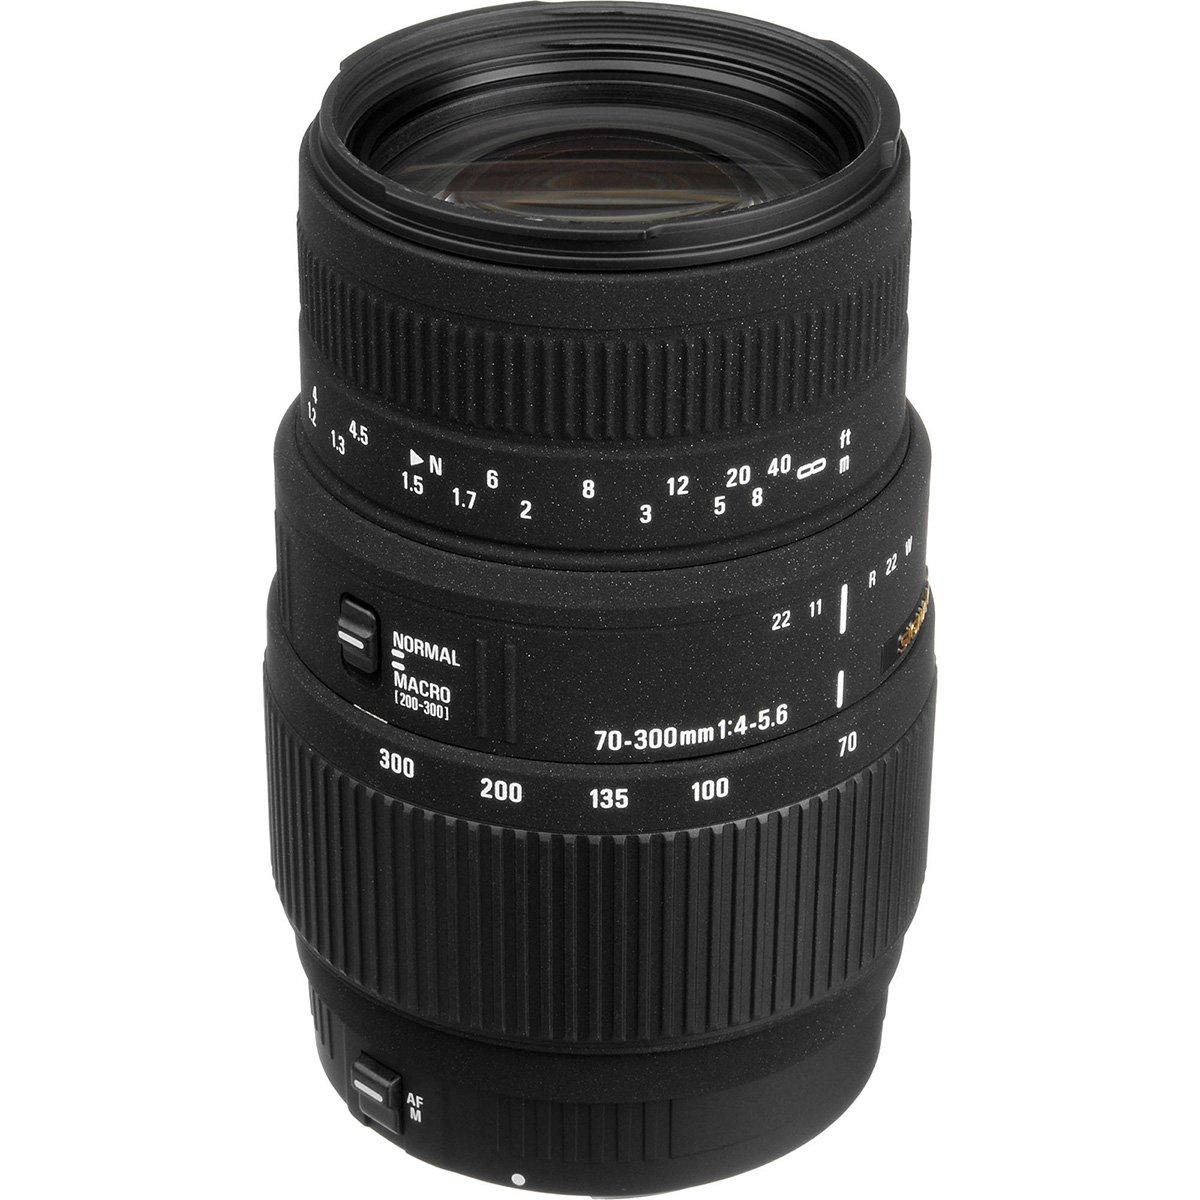 Sigma 70-300mm f/4-5.6 DG Motorized Macro Zoom Lens with Tripod + Filter + Strap + Kit for Nikon Digital SLR Cameras by Sigma (Image #2)